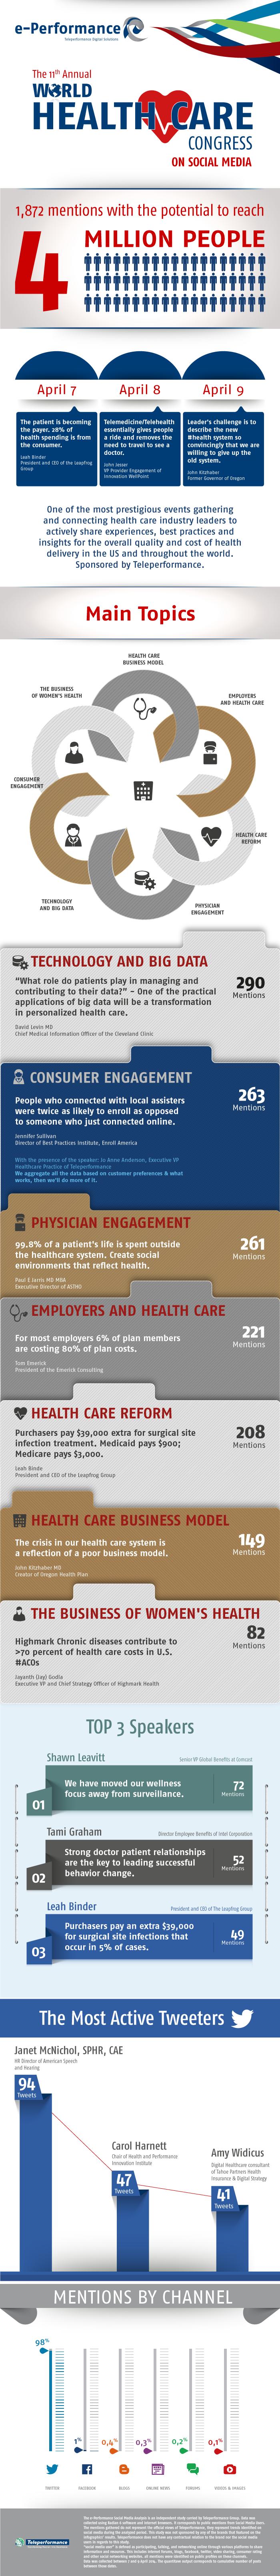 e-performance health care